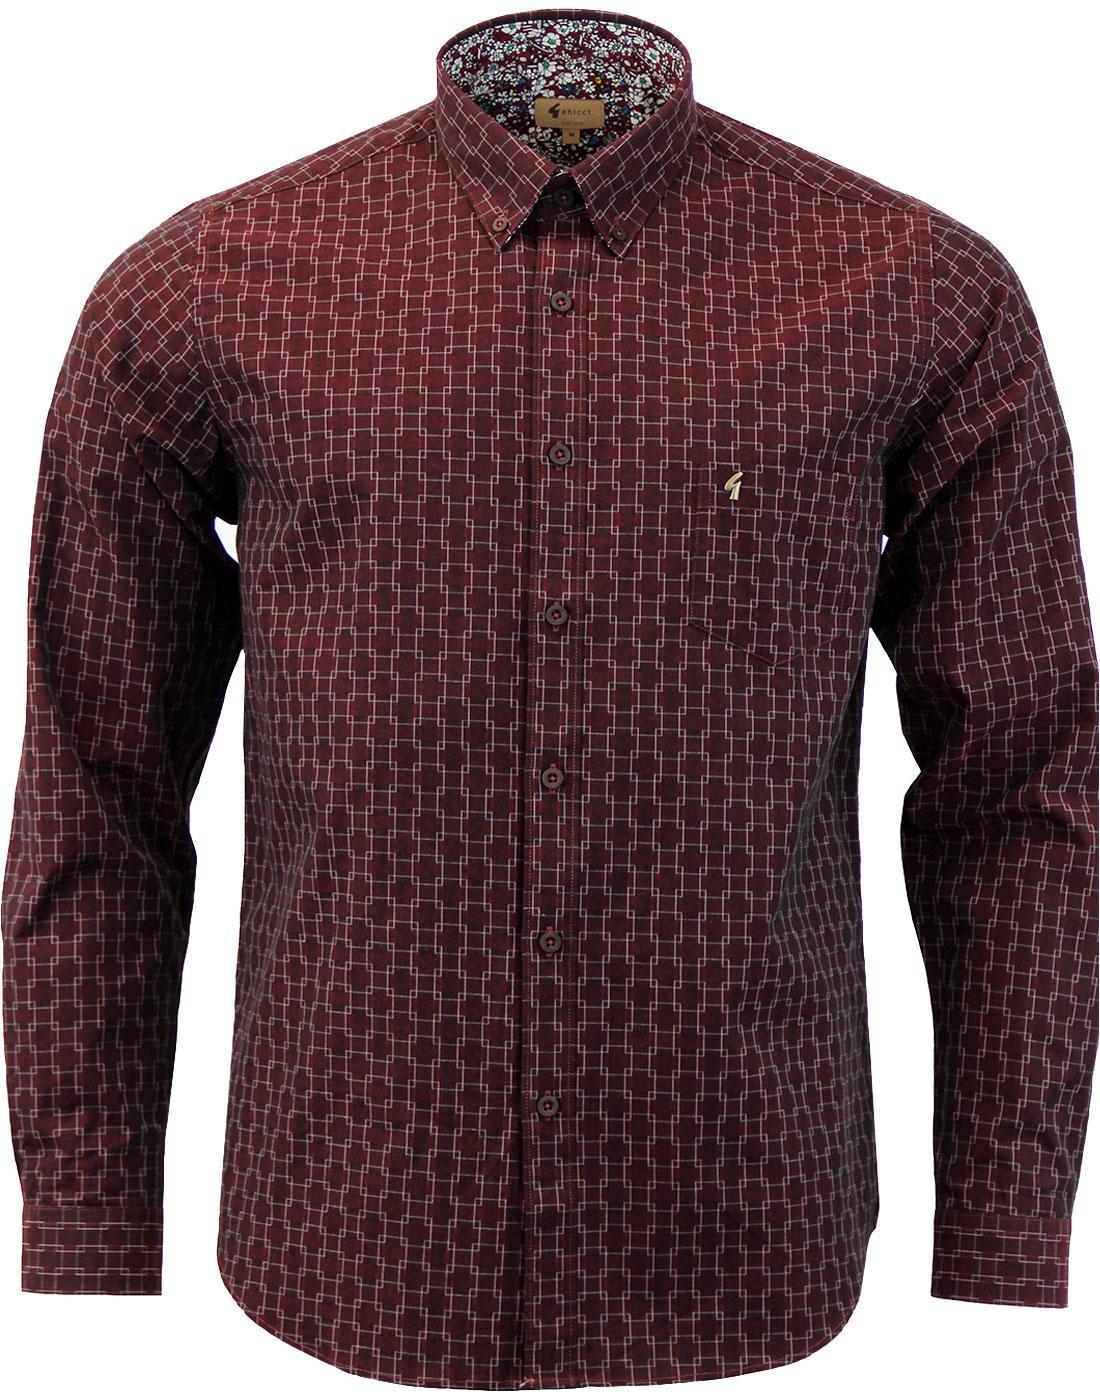 Newcross GABICCI VINTAGE Tonal Pattern Shirt P